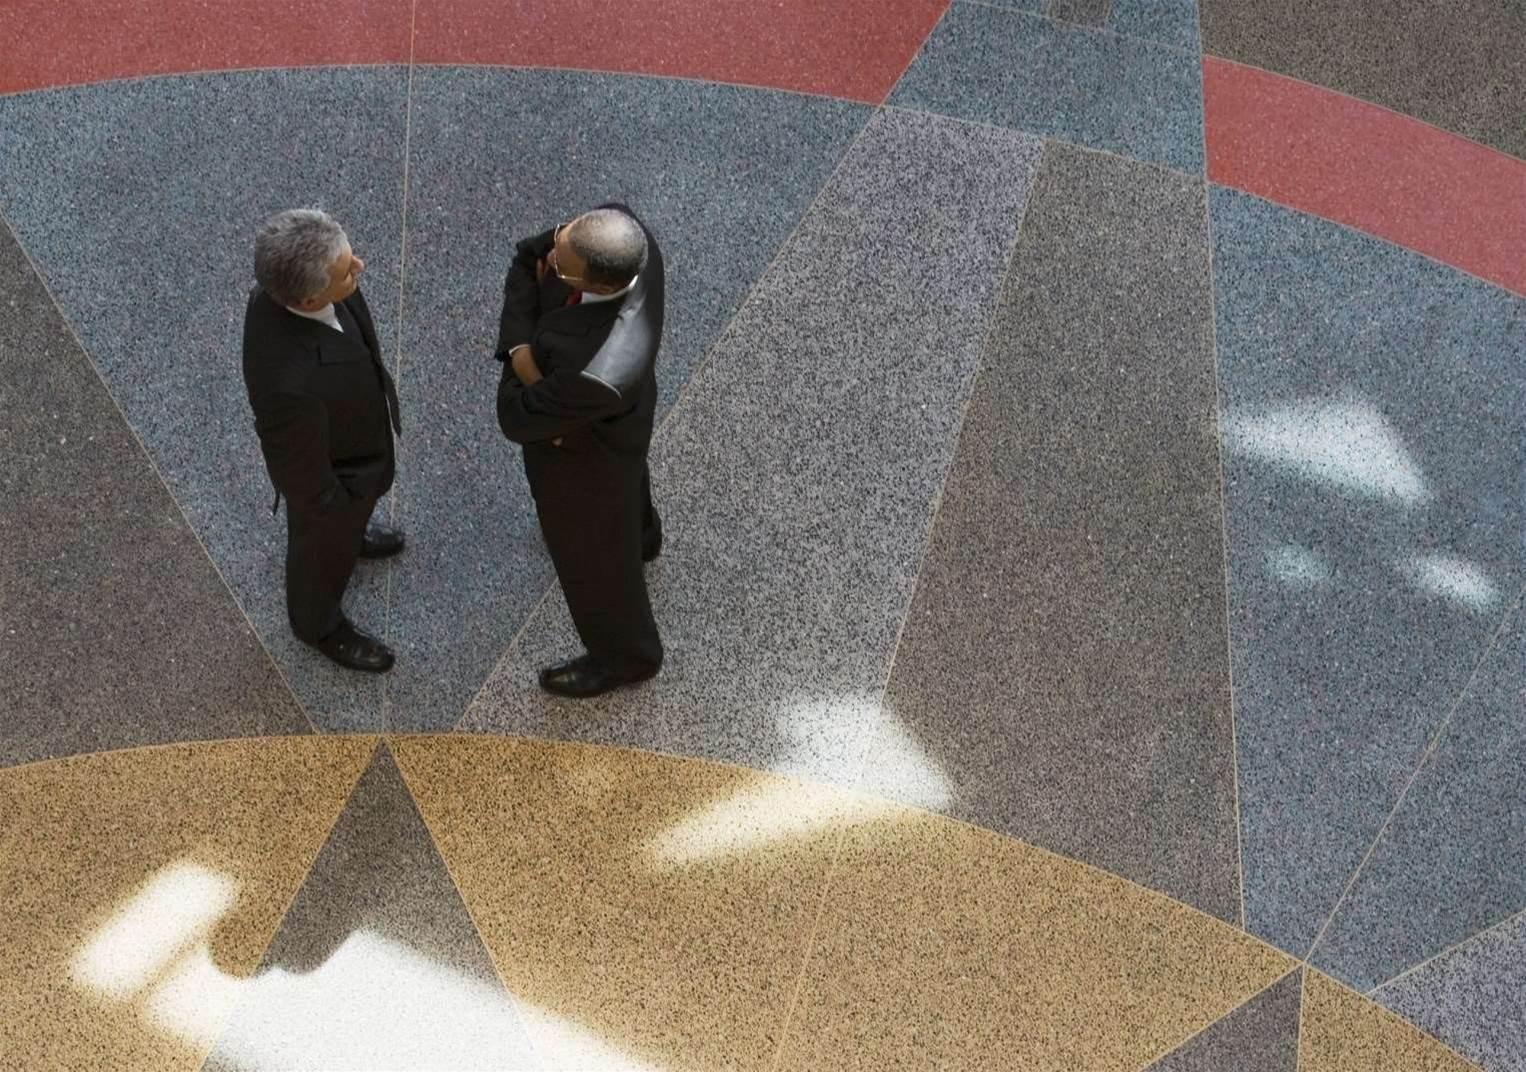 Optus-NBN deal would make 'total sense', says Budde